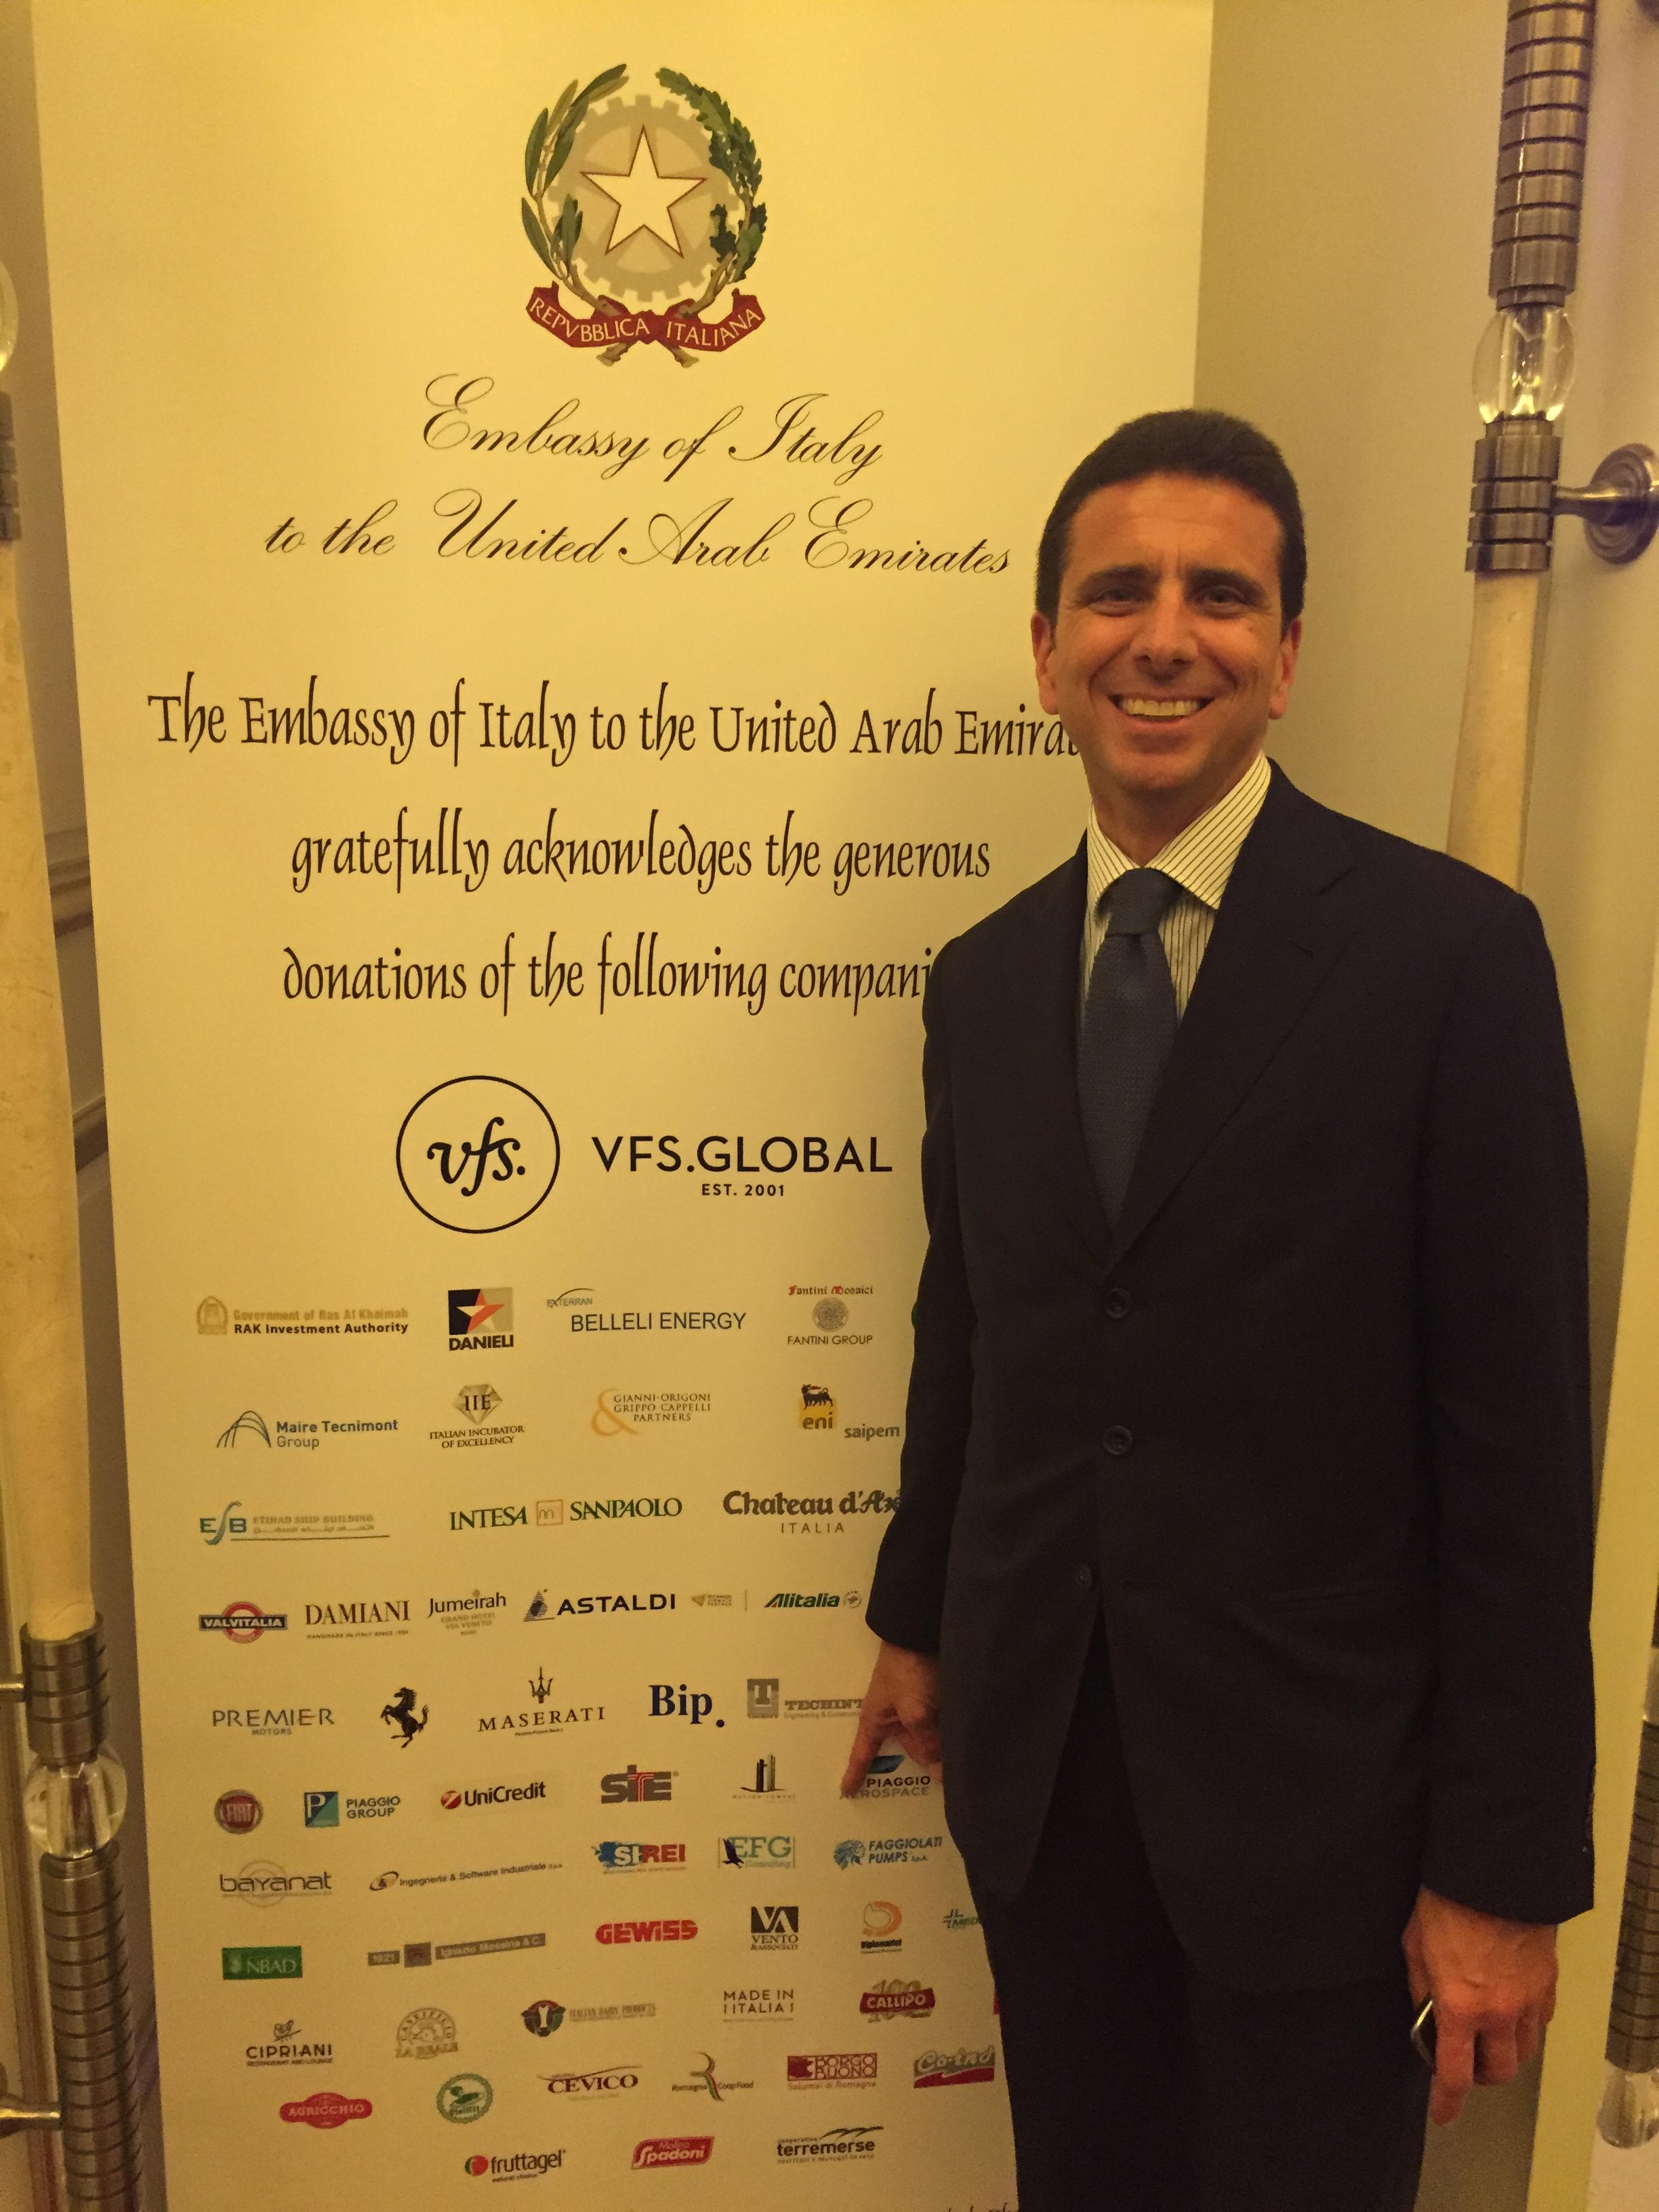 2giugno2015-Embassy Italy Abu Dhabi